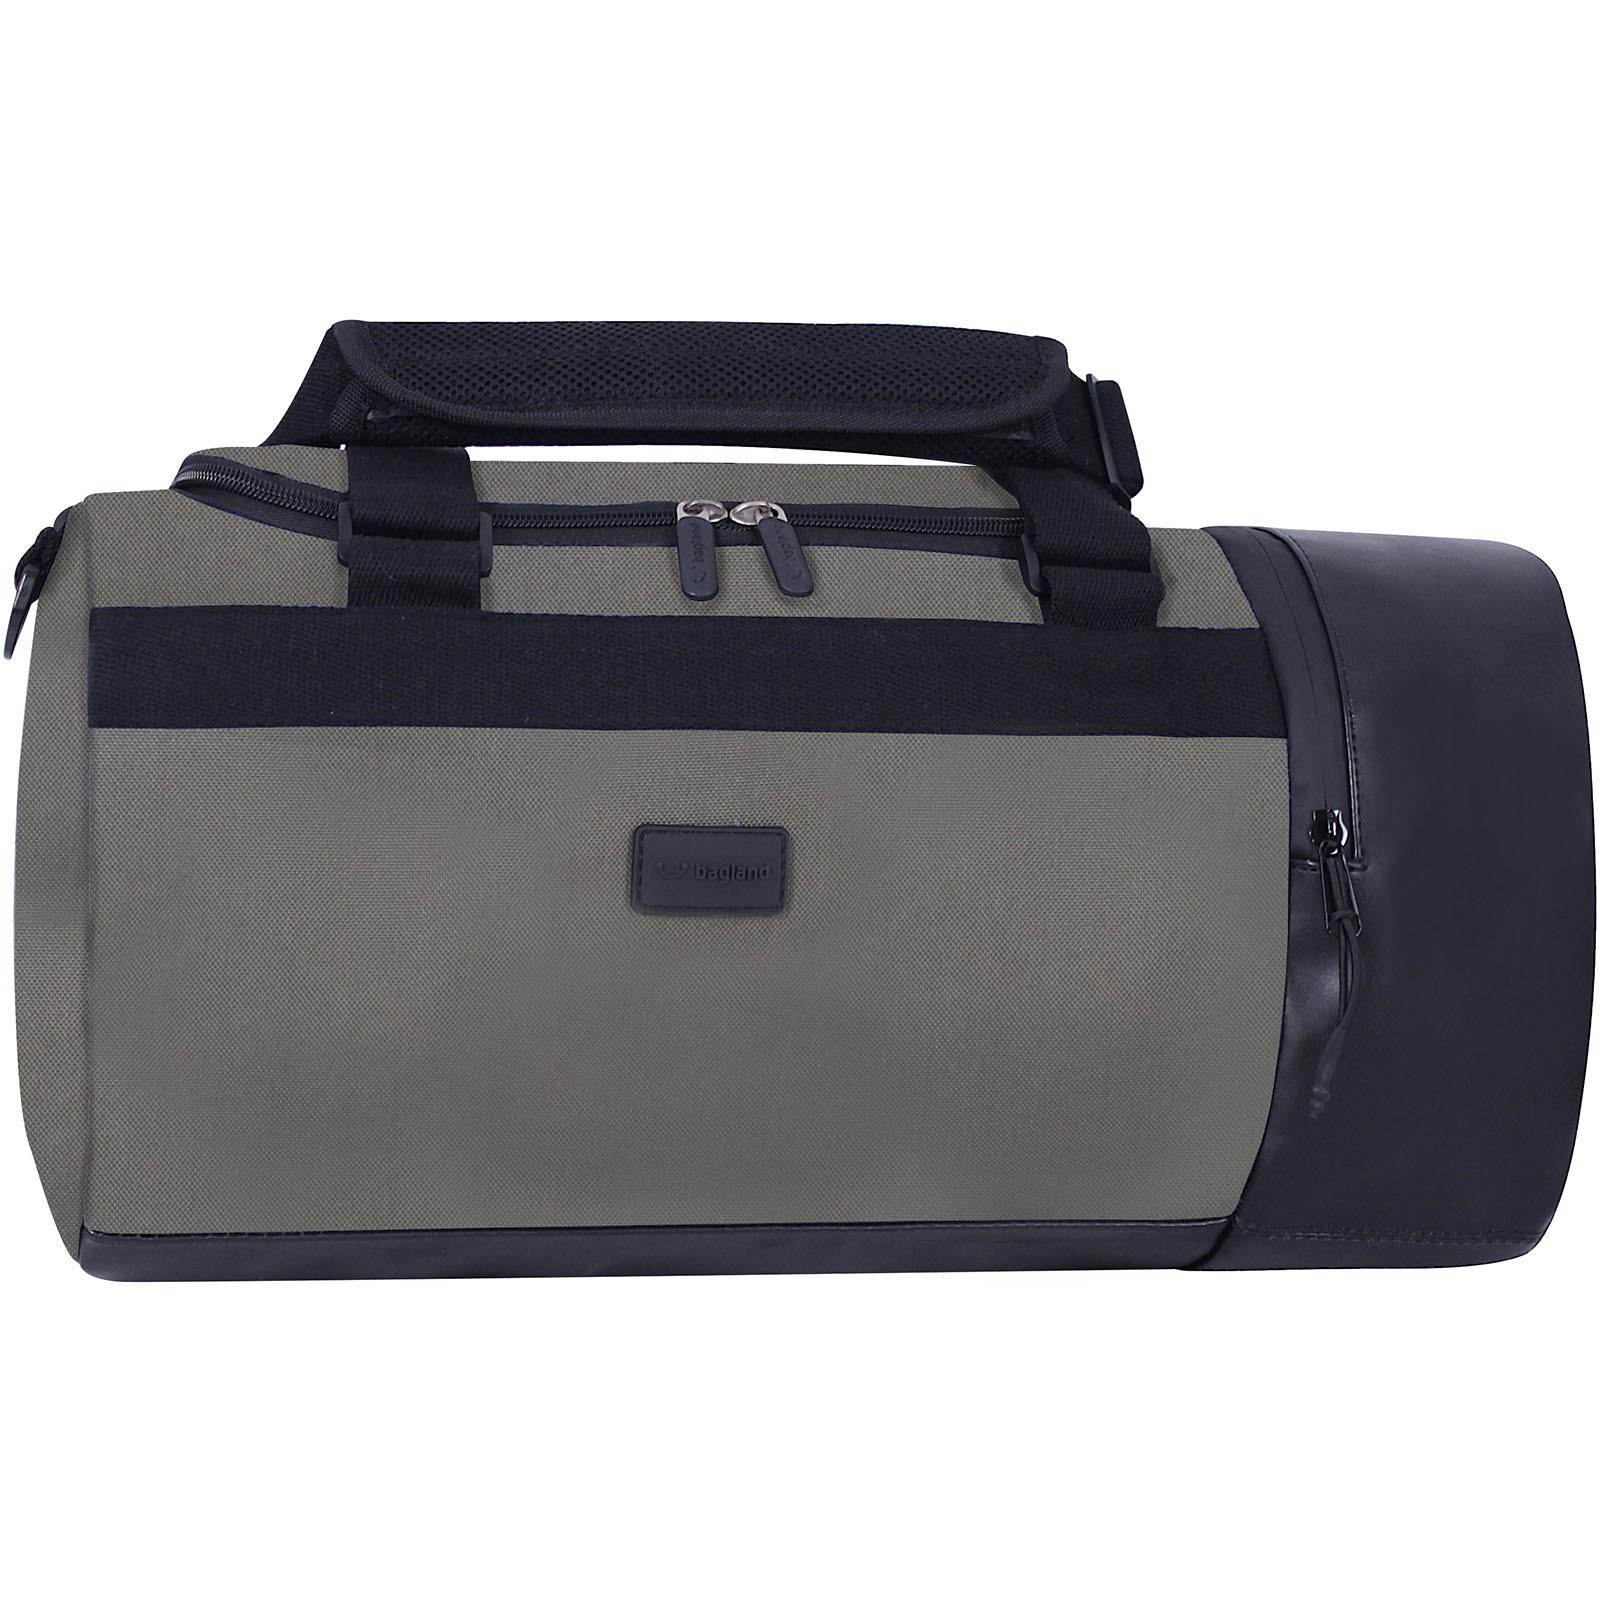 Спортивные сумки Сумка Bagland Klerk 22 л. Хаки (0032766) IMG_5953.JPG